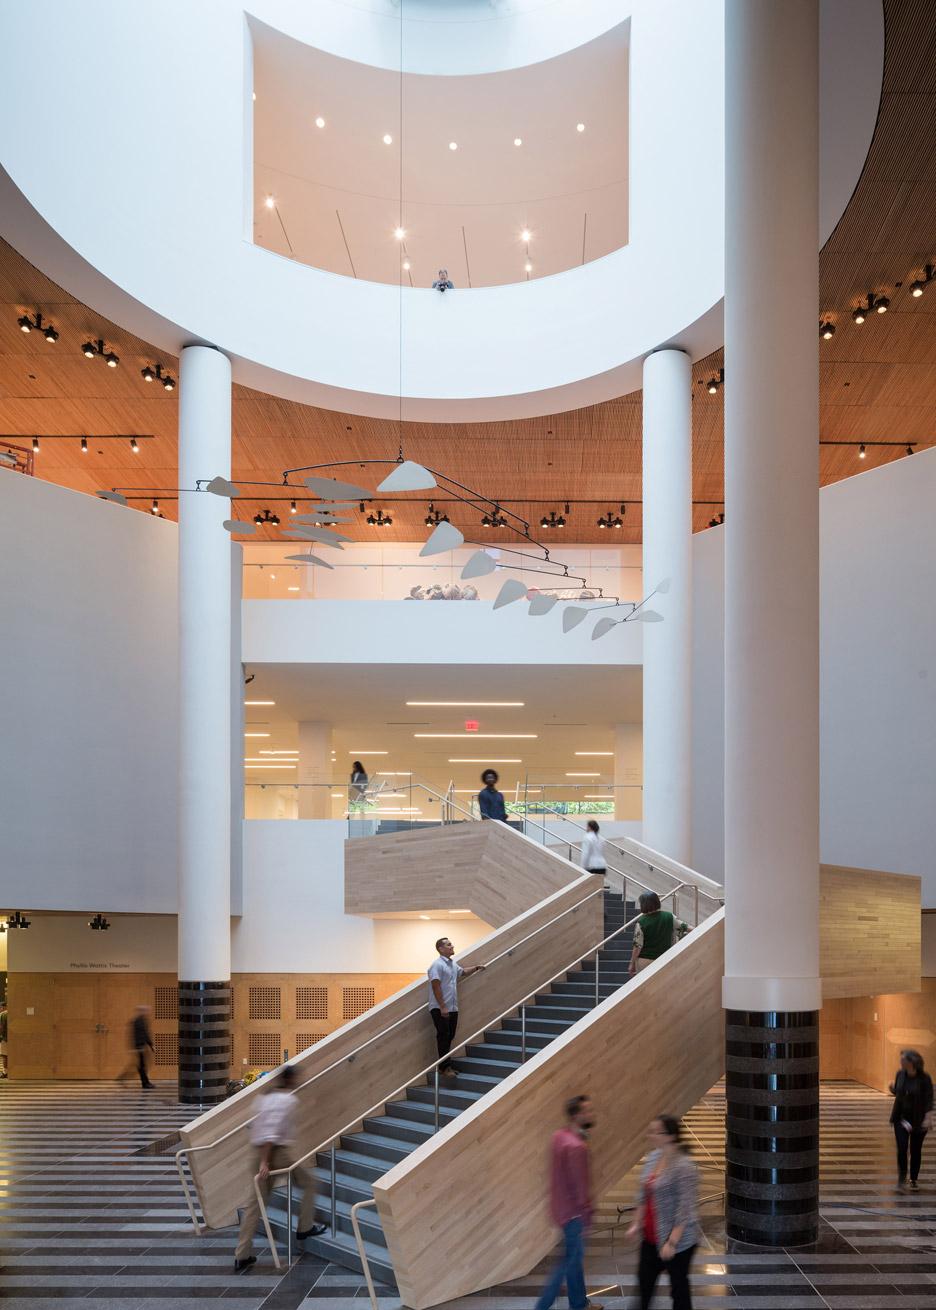 sfmoma-snohetta-cultural-museum-san-francisco-construction-boom-architecture-news-usa-iwan-baan_dezeen_936_4